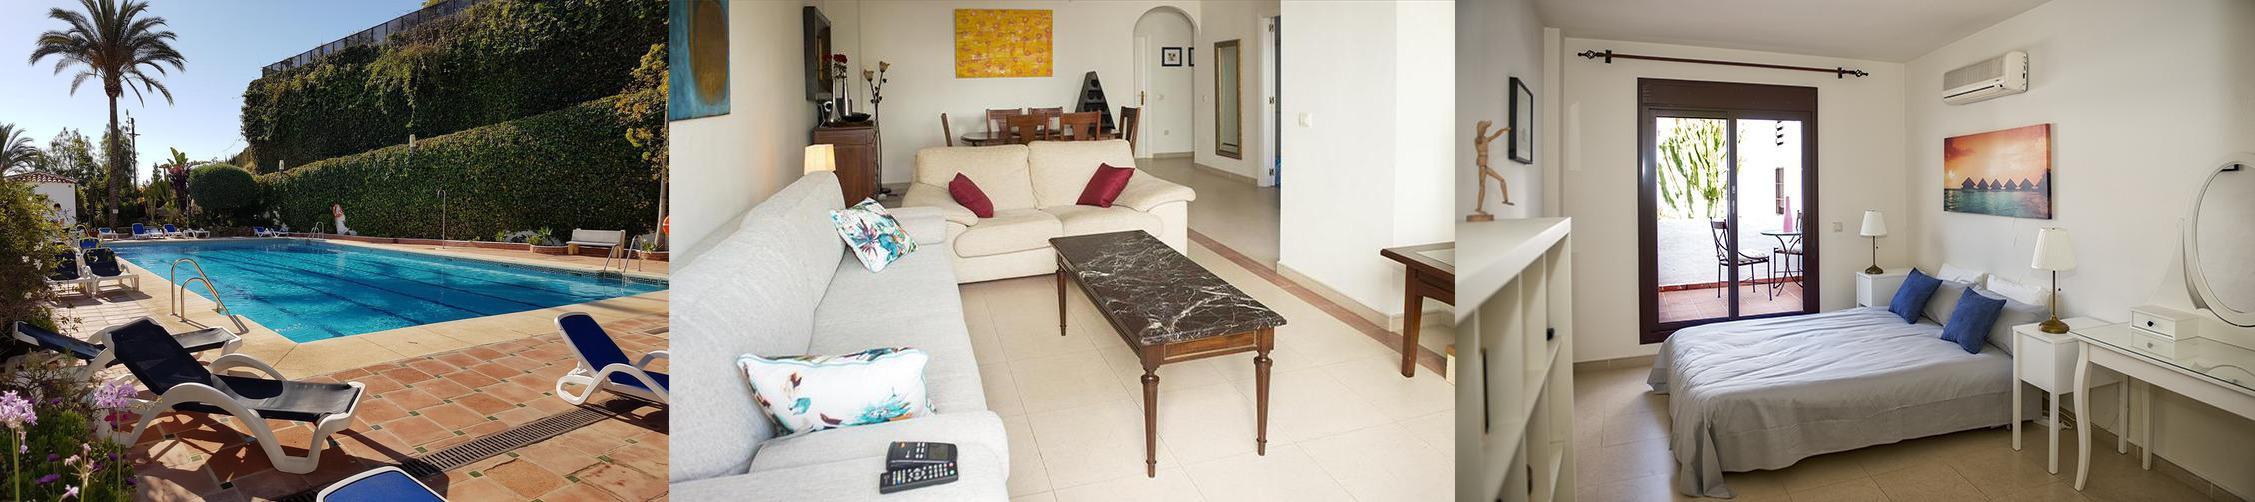 luxe-villa-puerto-banus